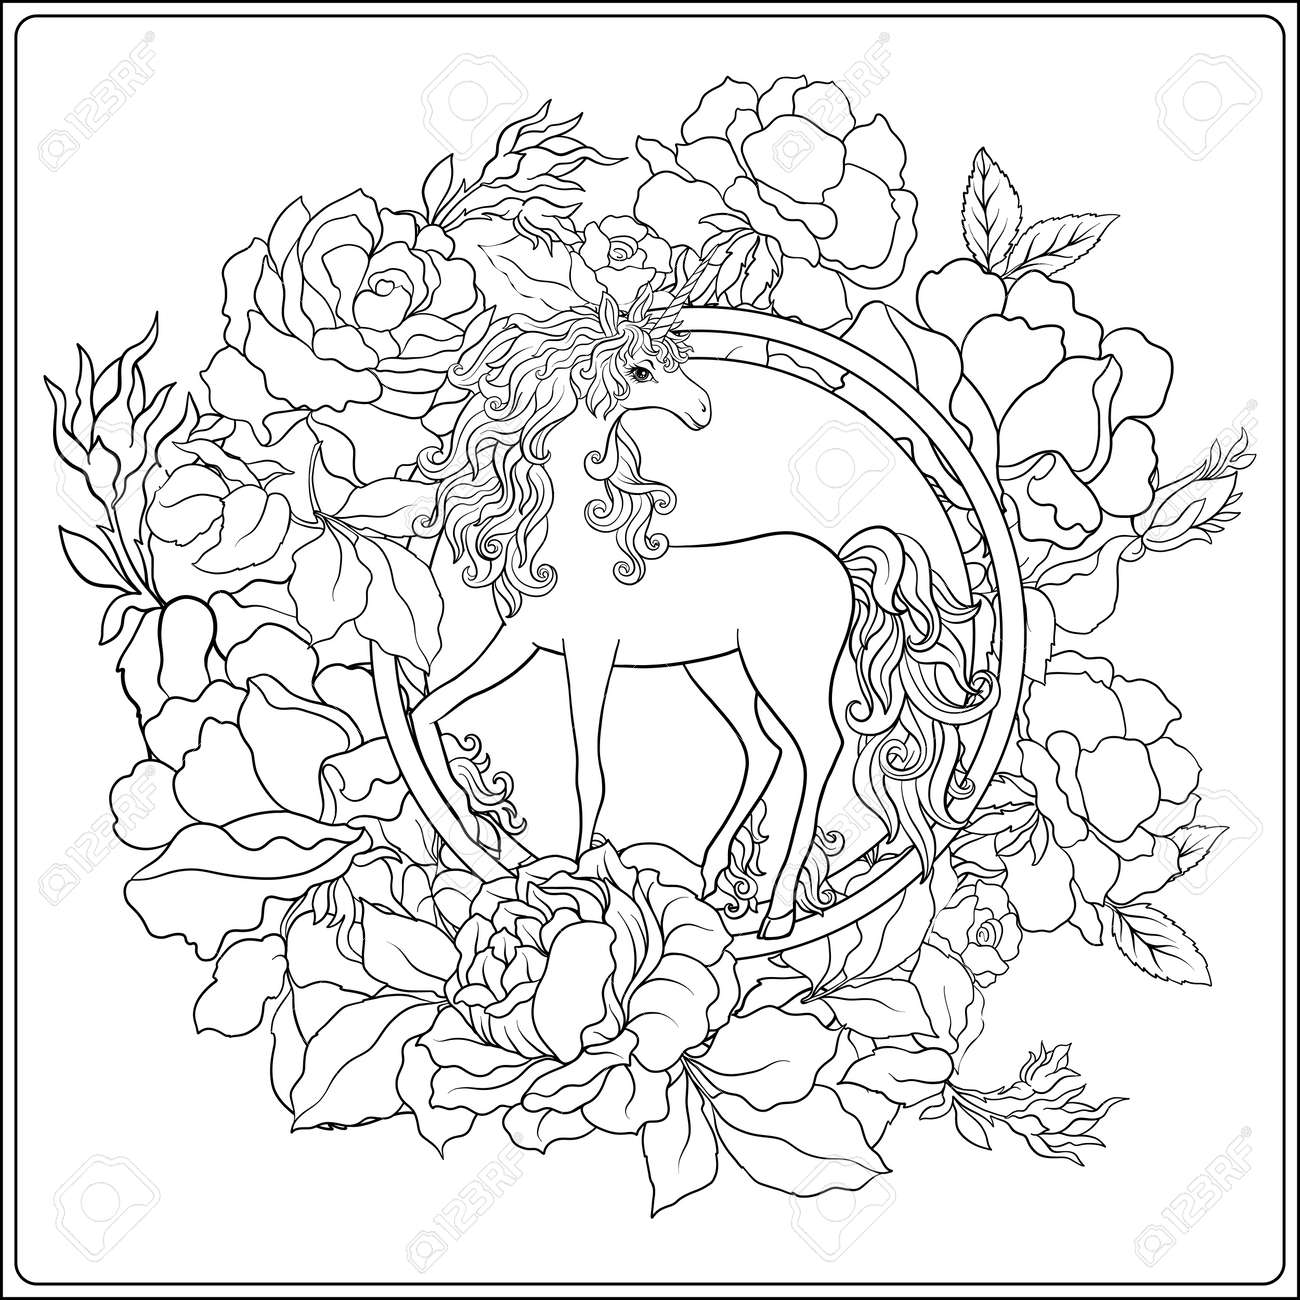 Perfecto Unicornio Miserable Para Colorear Inspiración - Enmarcado ...